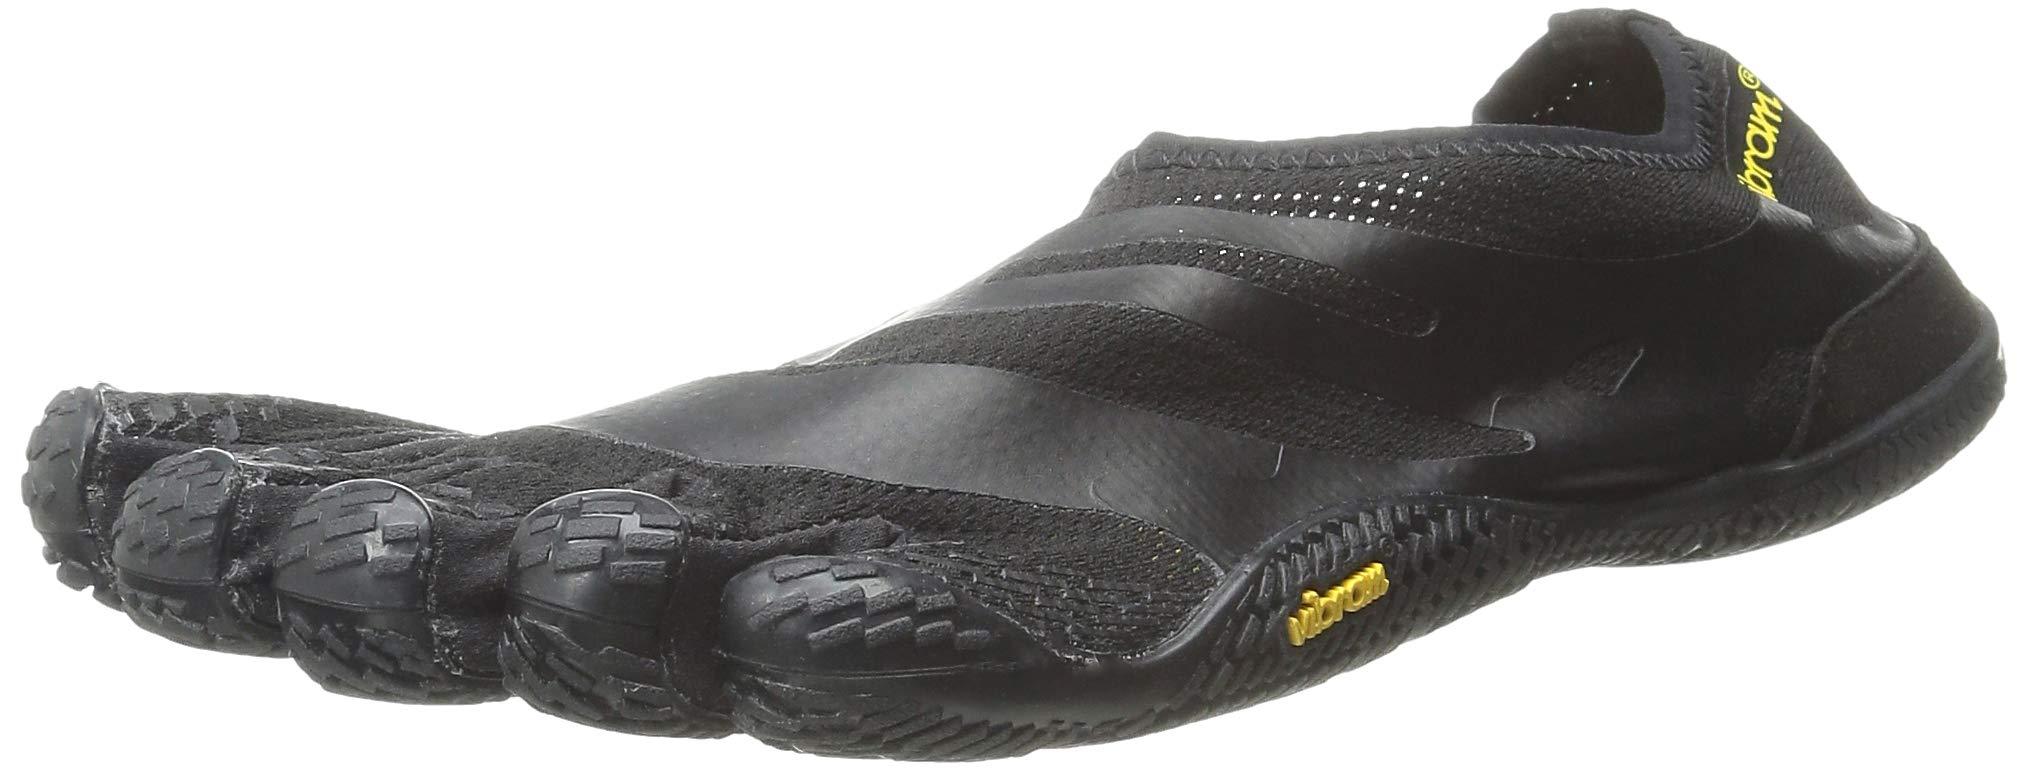 FiveFingers Men's El-x Fitness Shoes